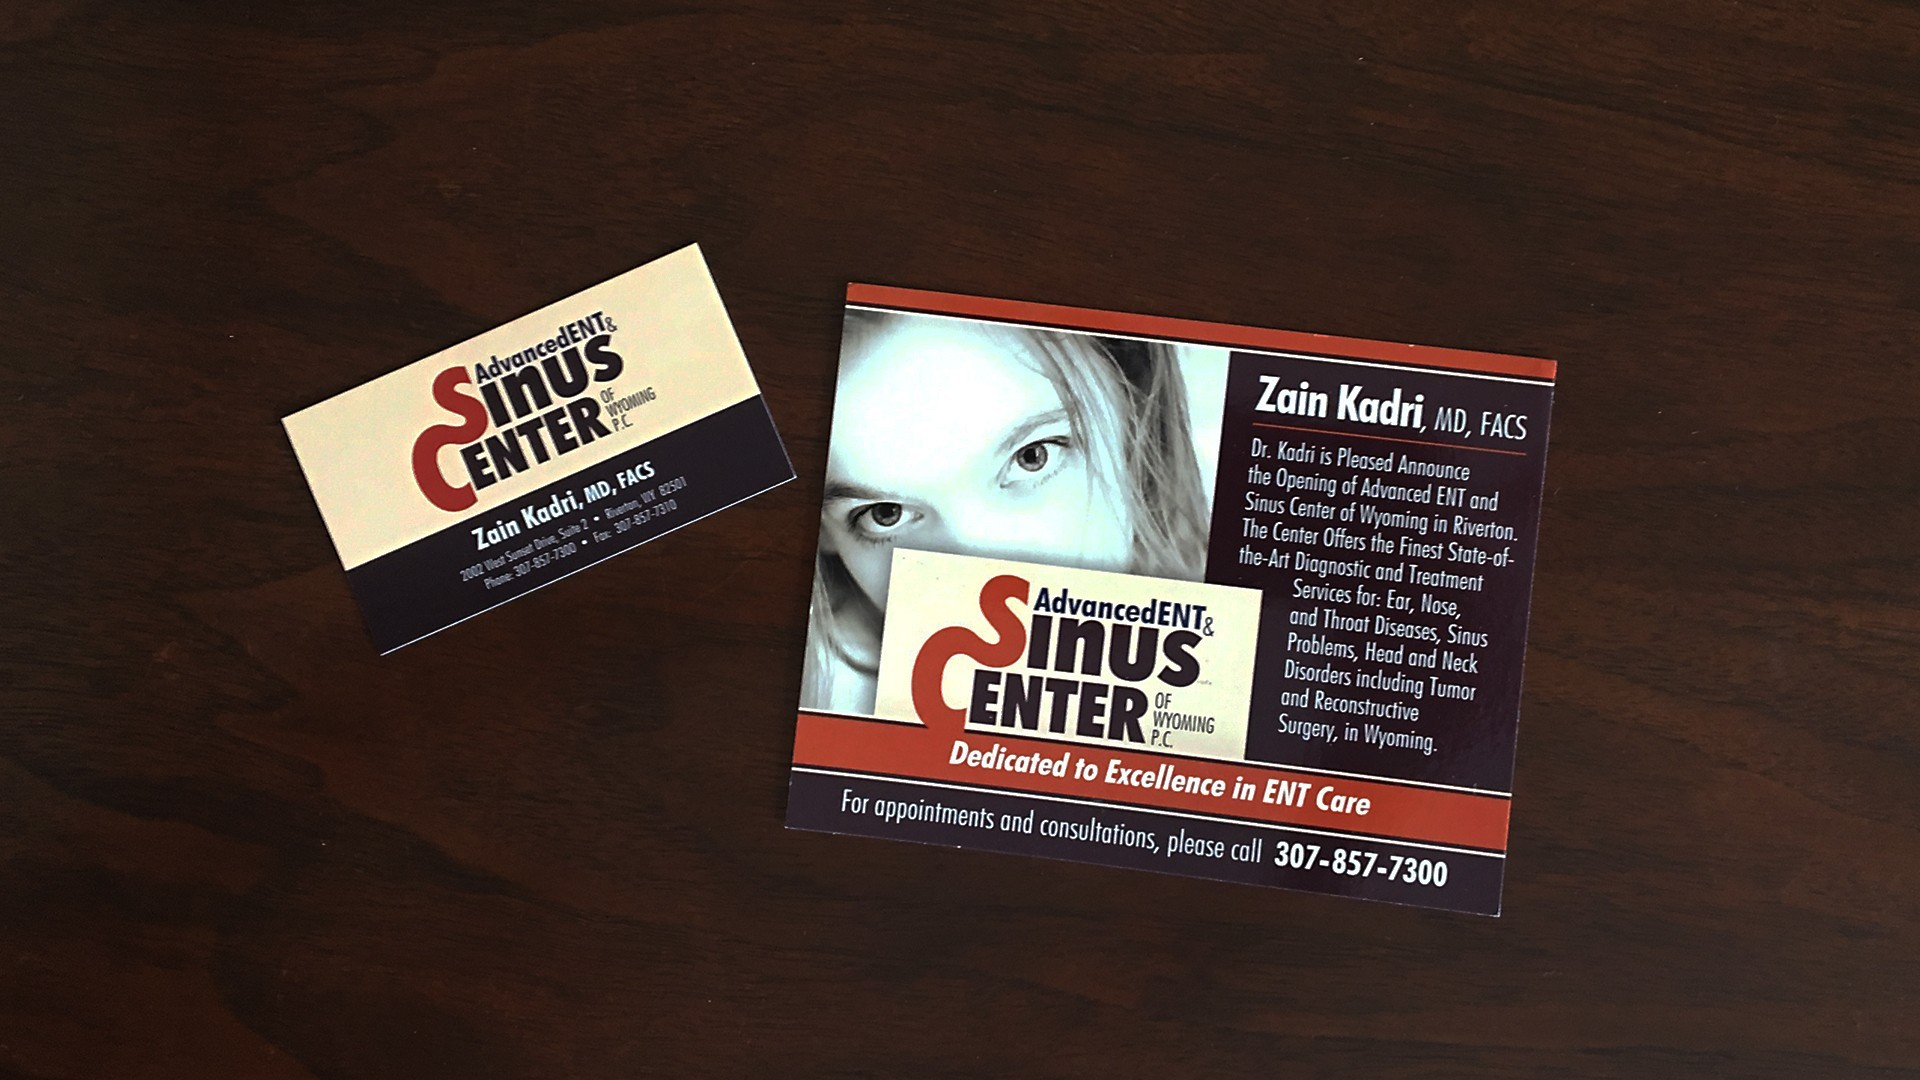 Advanced ENT & Sinus Center